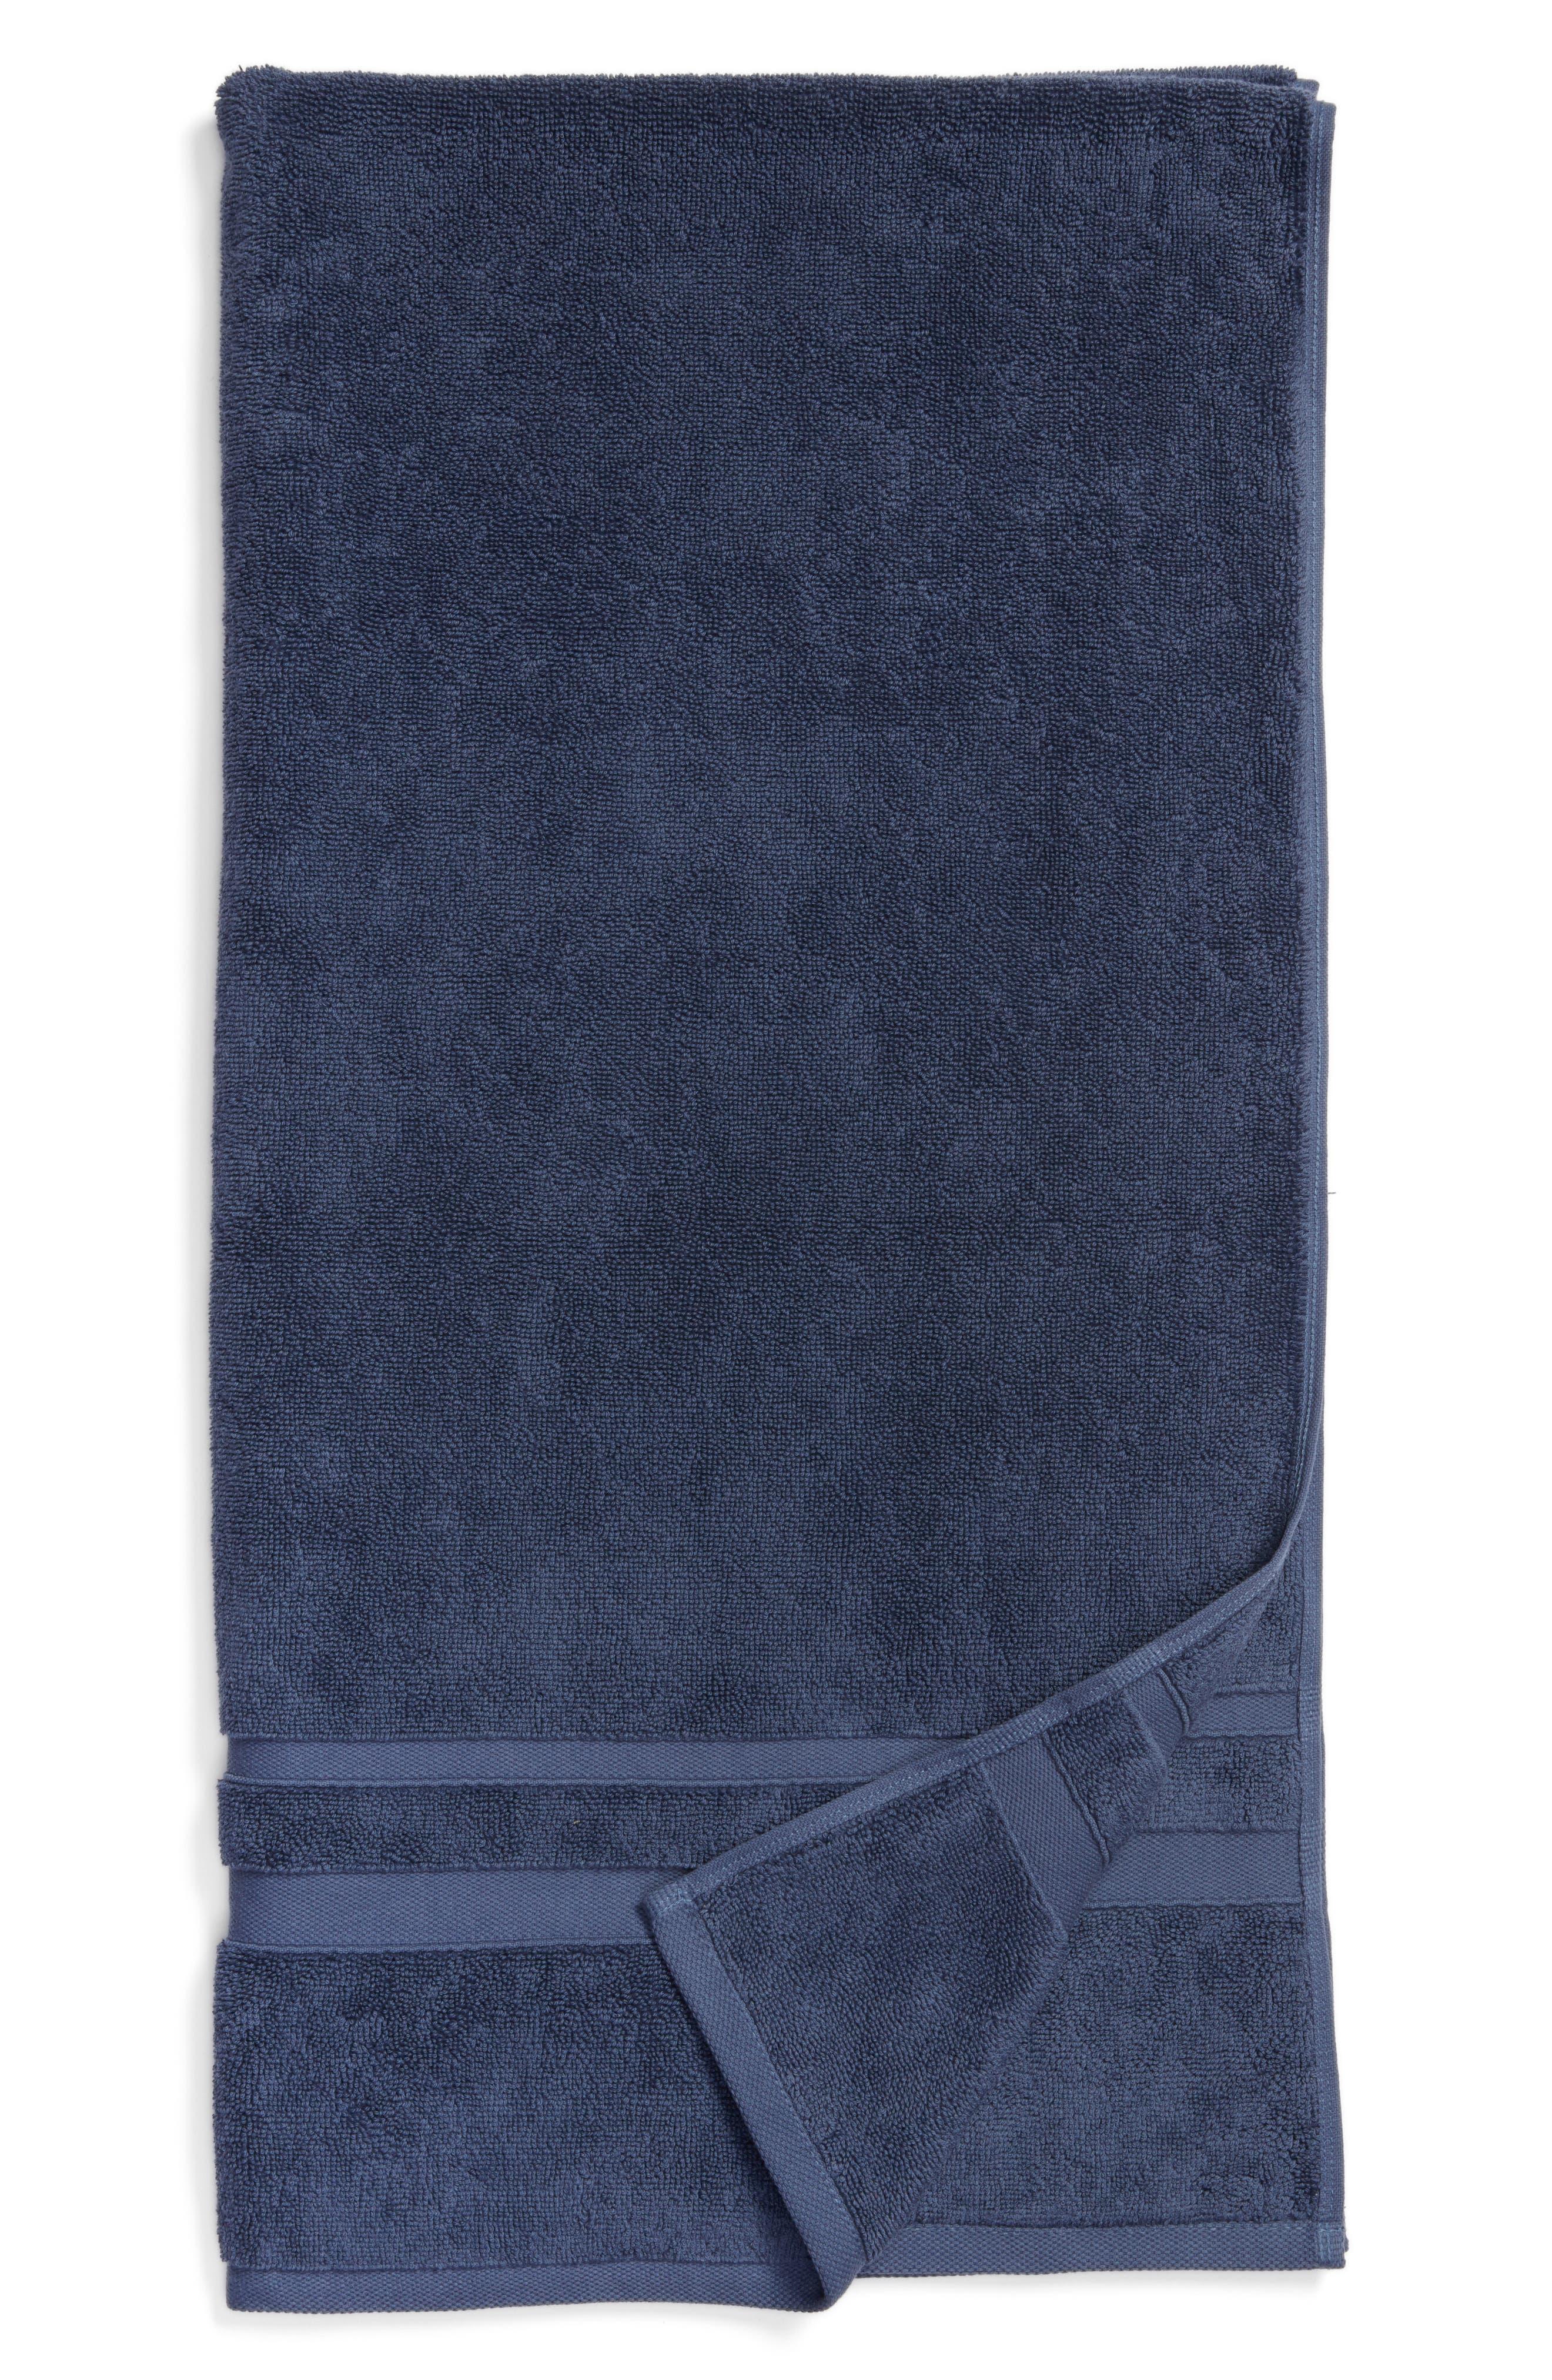 Studio 'Perennial' Turkish Cotton Bath Towel,                             Main thumbnail 1, color,                             INDIGO BLUE